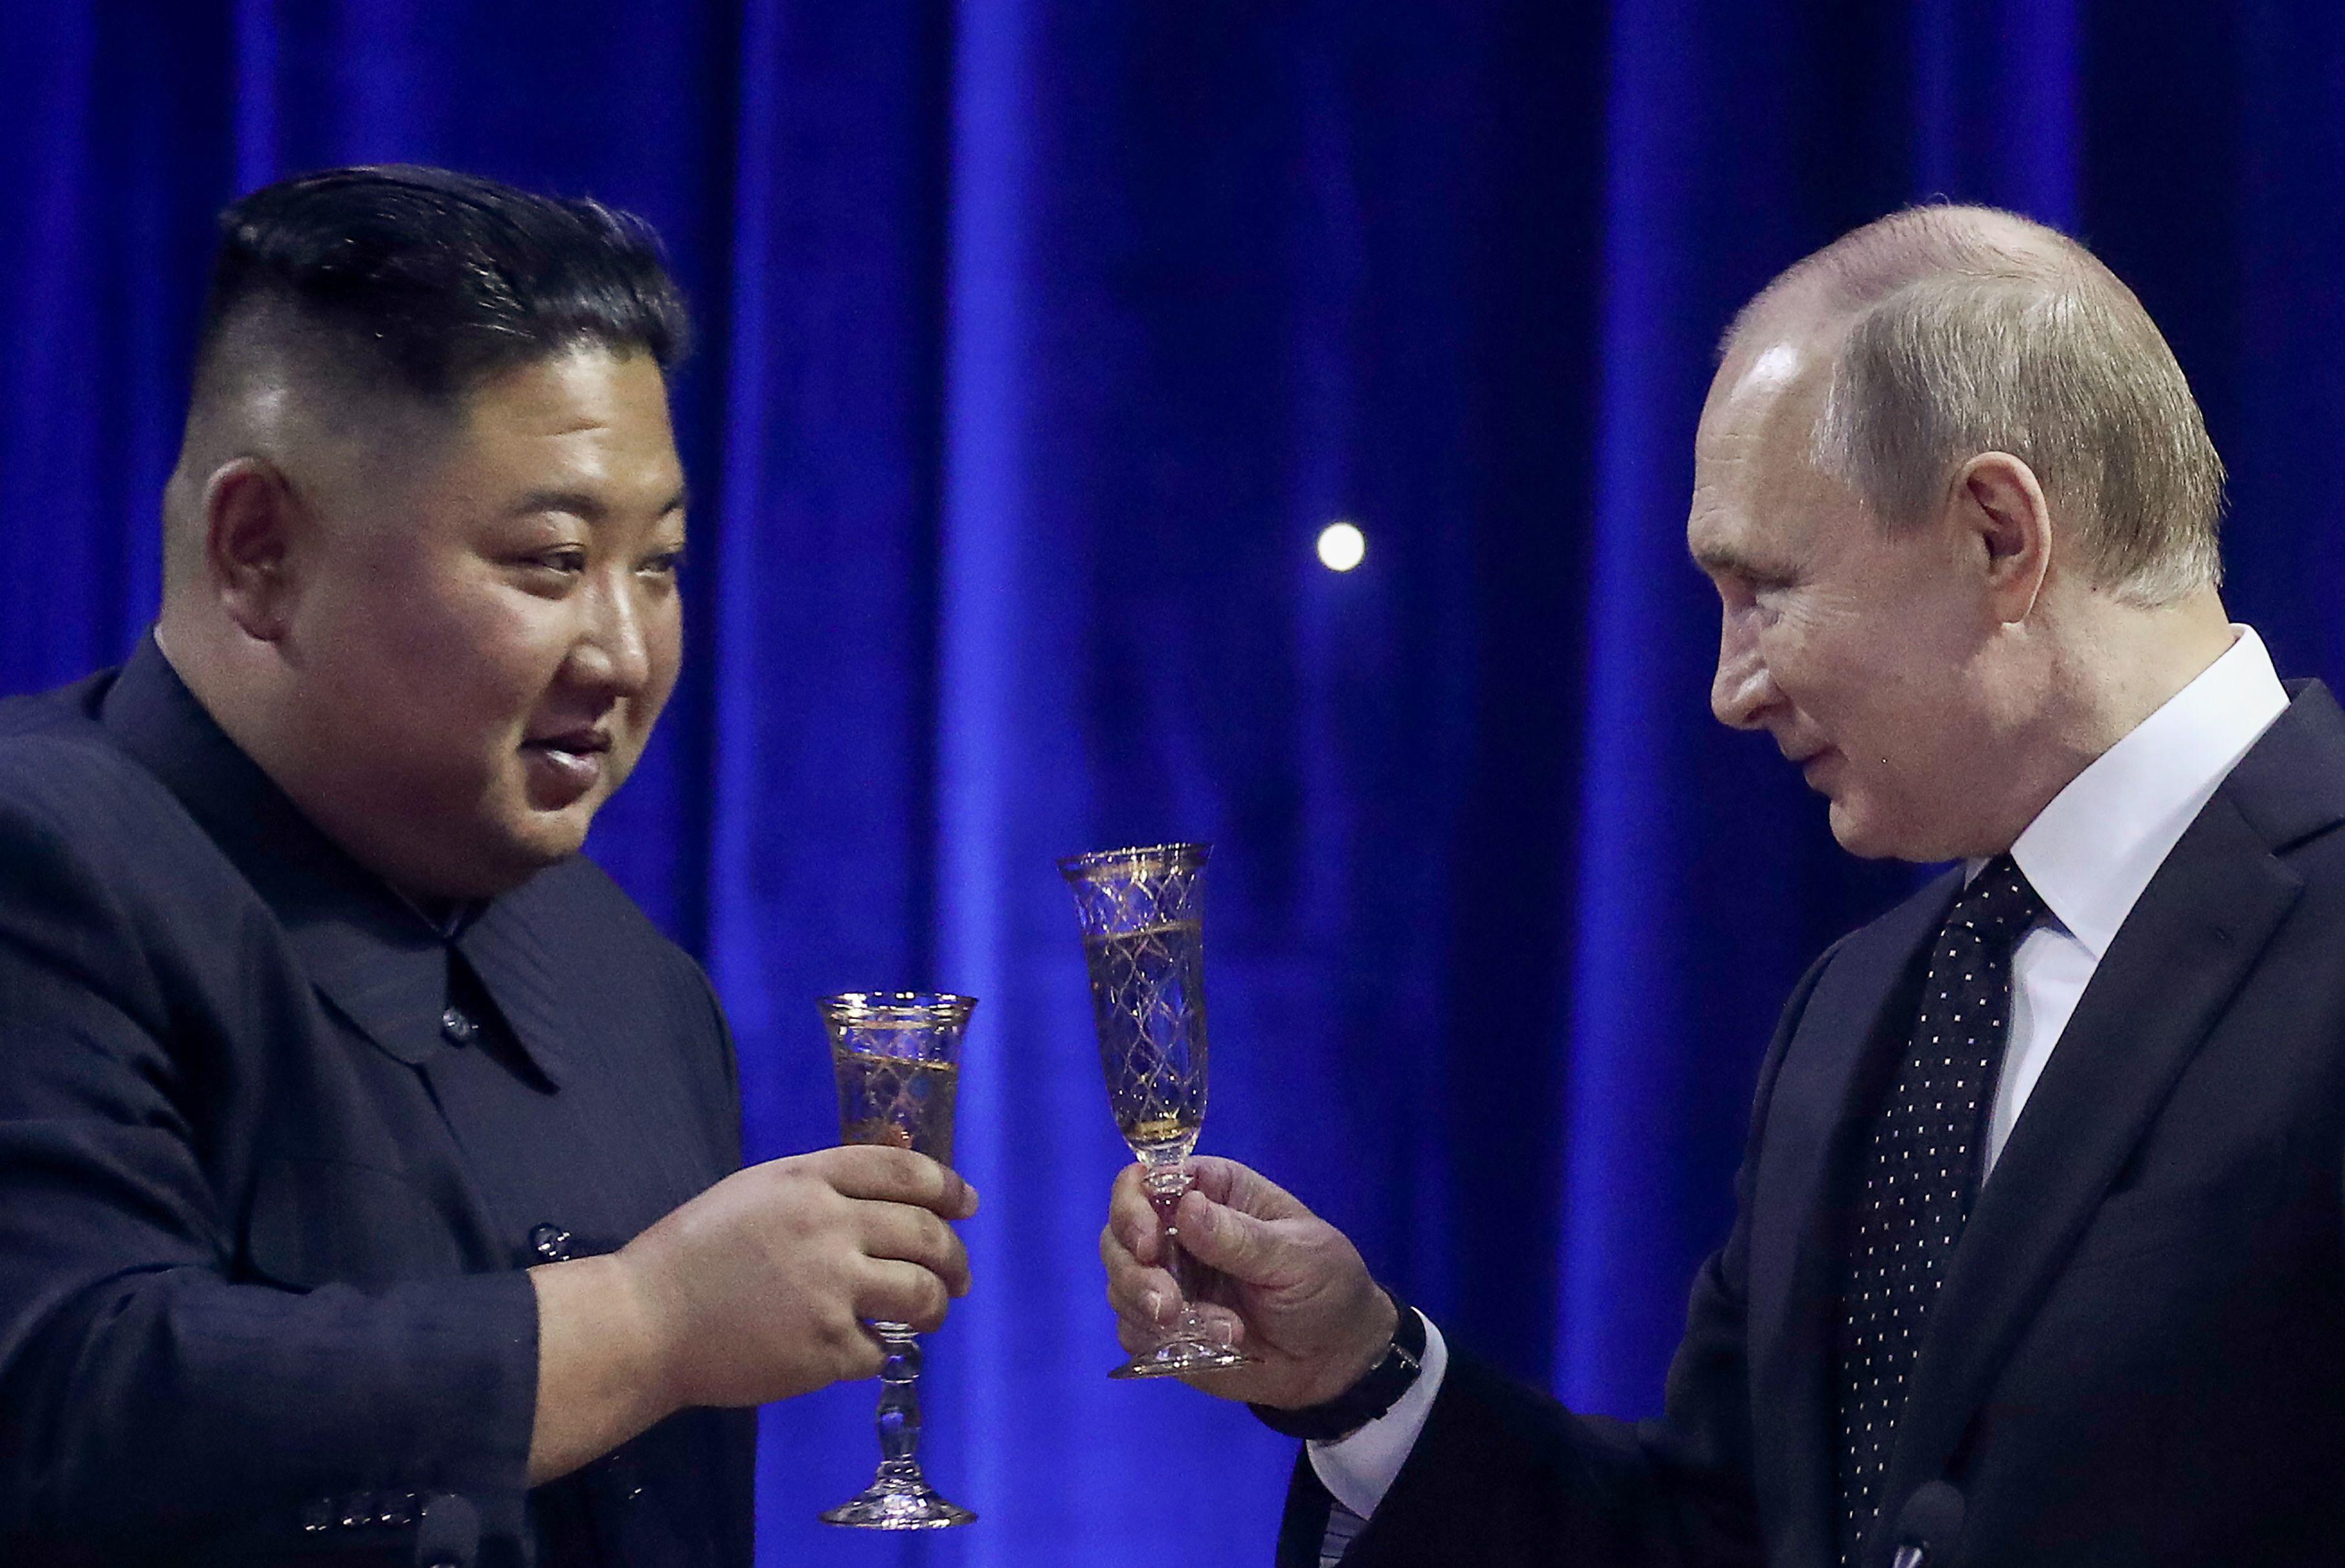 Kim Jong Un y Vladimir Putin. Fotografía: Valery Sharifulin/Tass via Getty Images